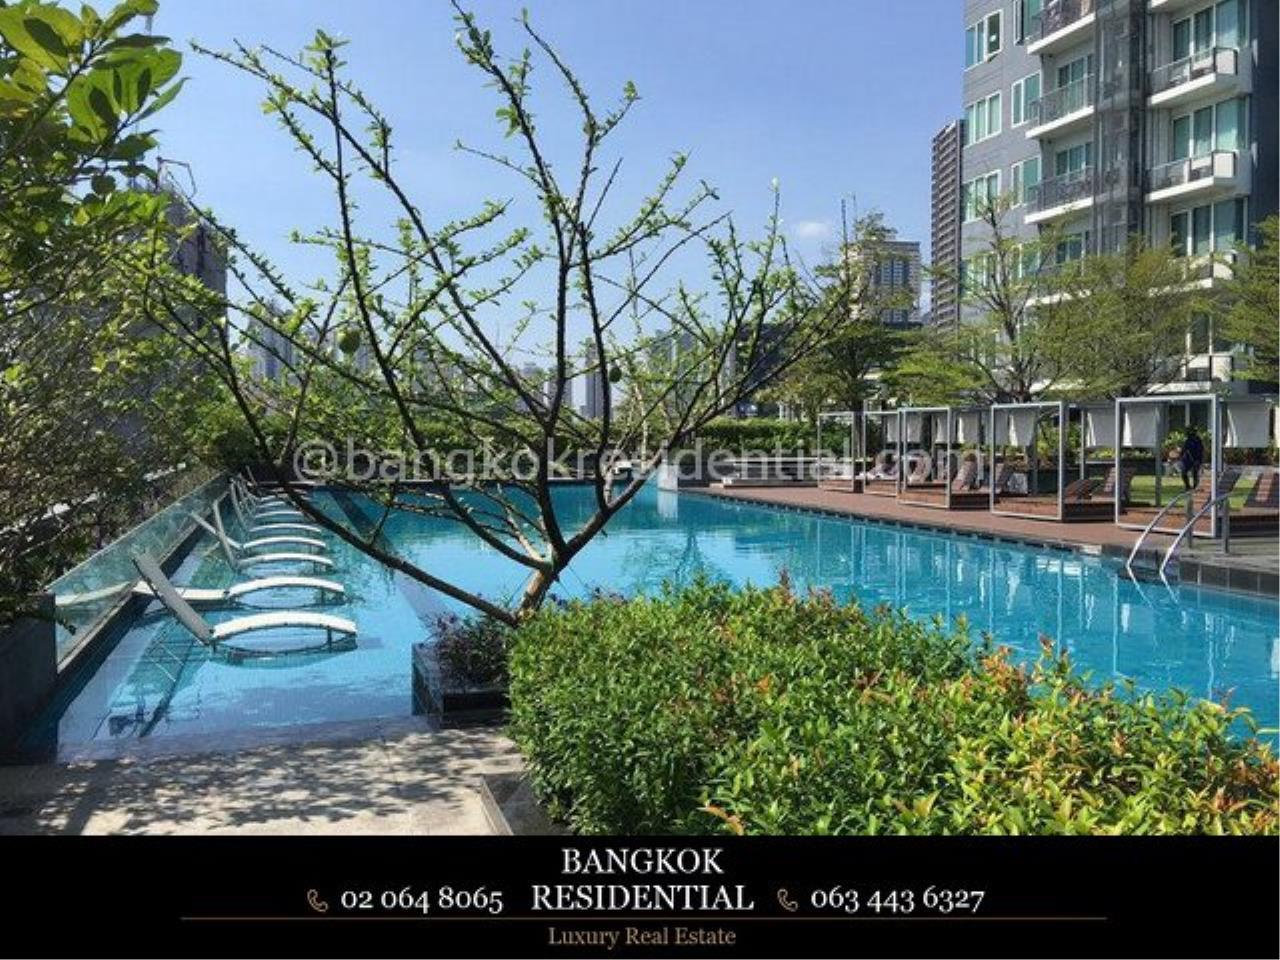 Bangkok Residential Agency's 1BR Siri at Sukhumvit For Rent (BR4782CD) 9